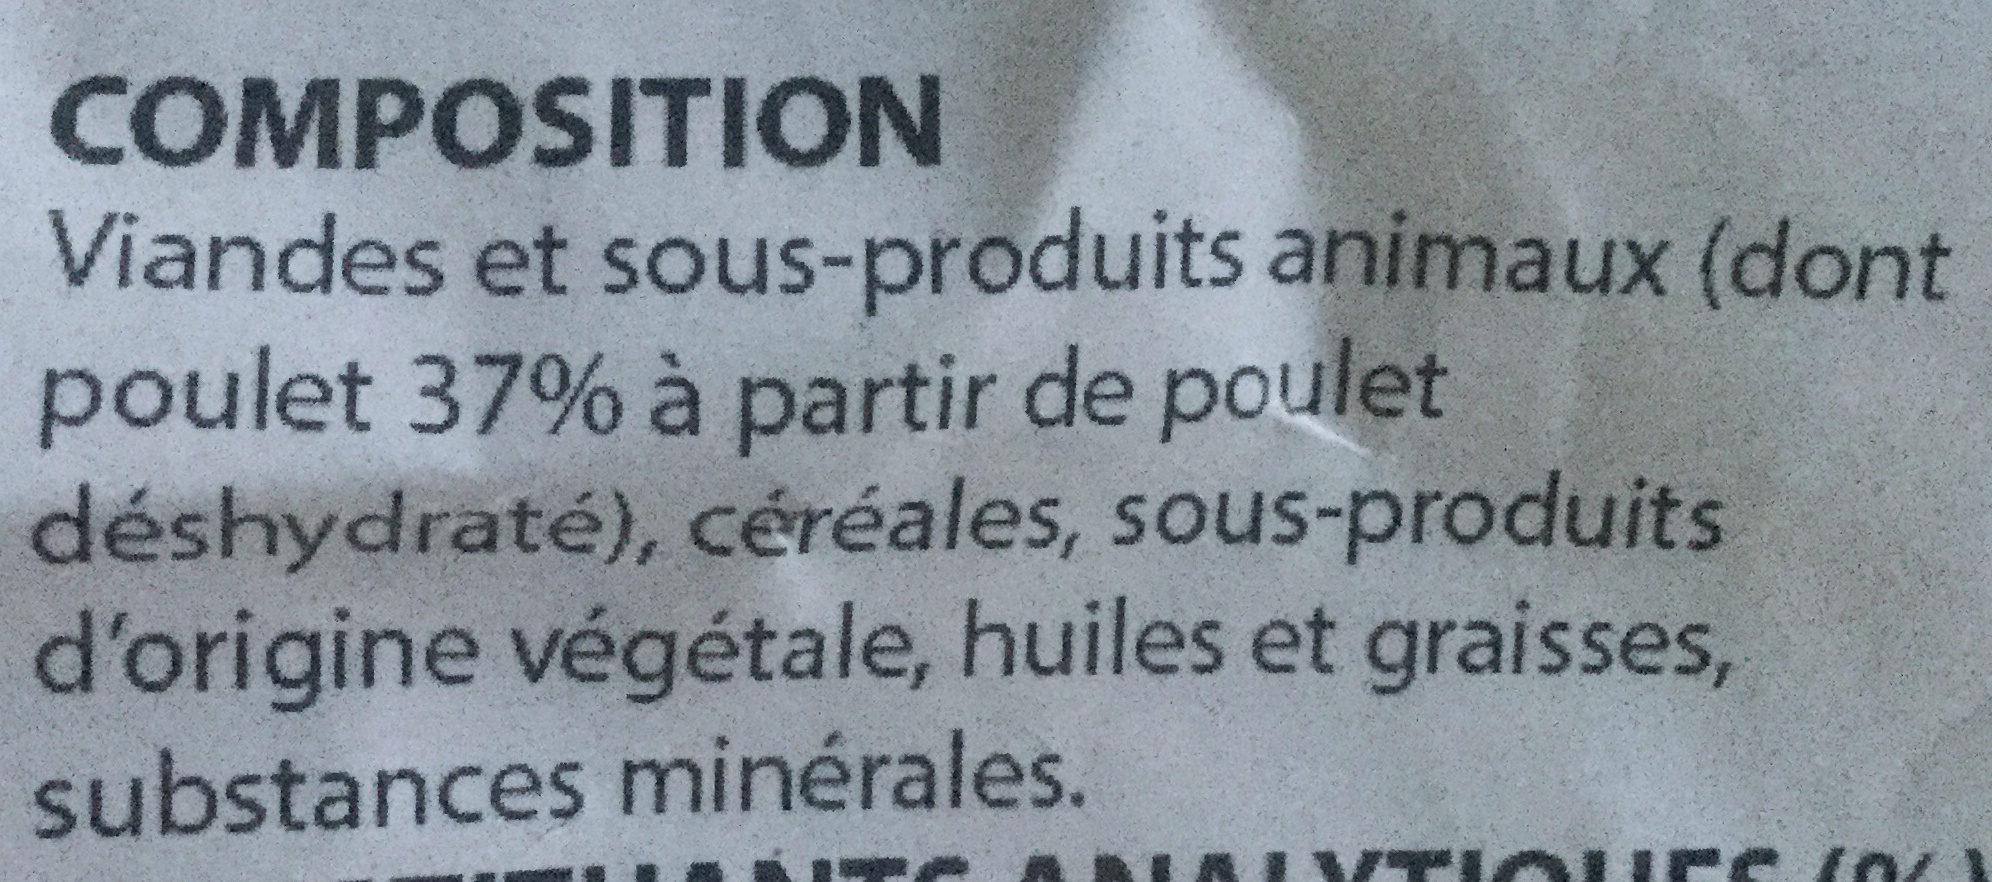 Athlétique - Ingredients